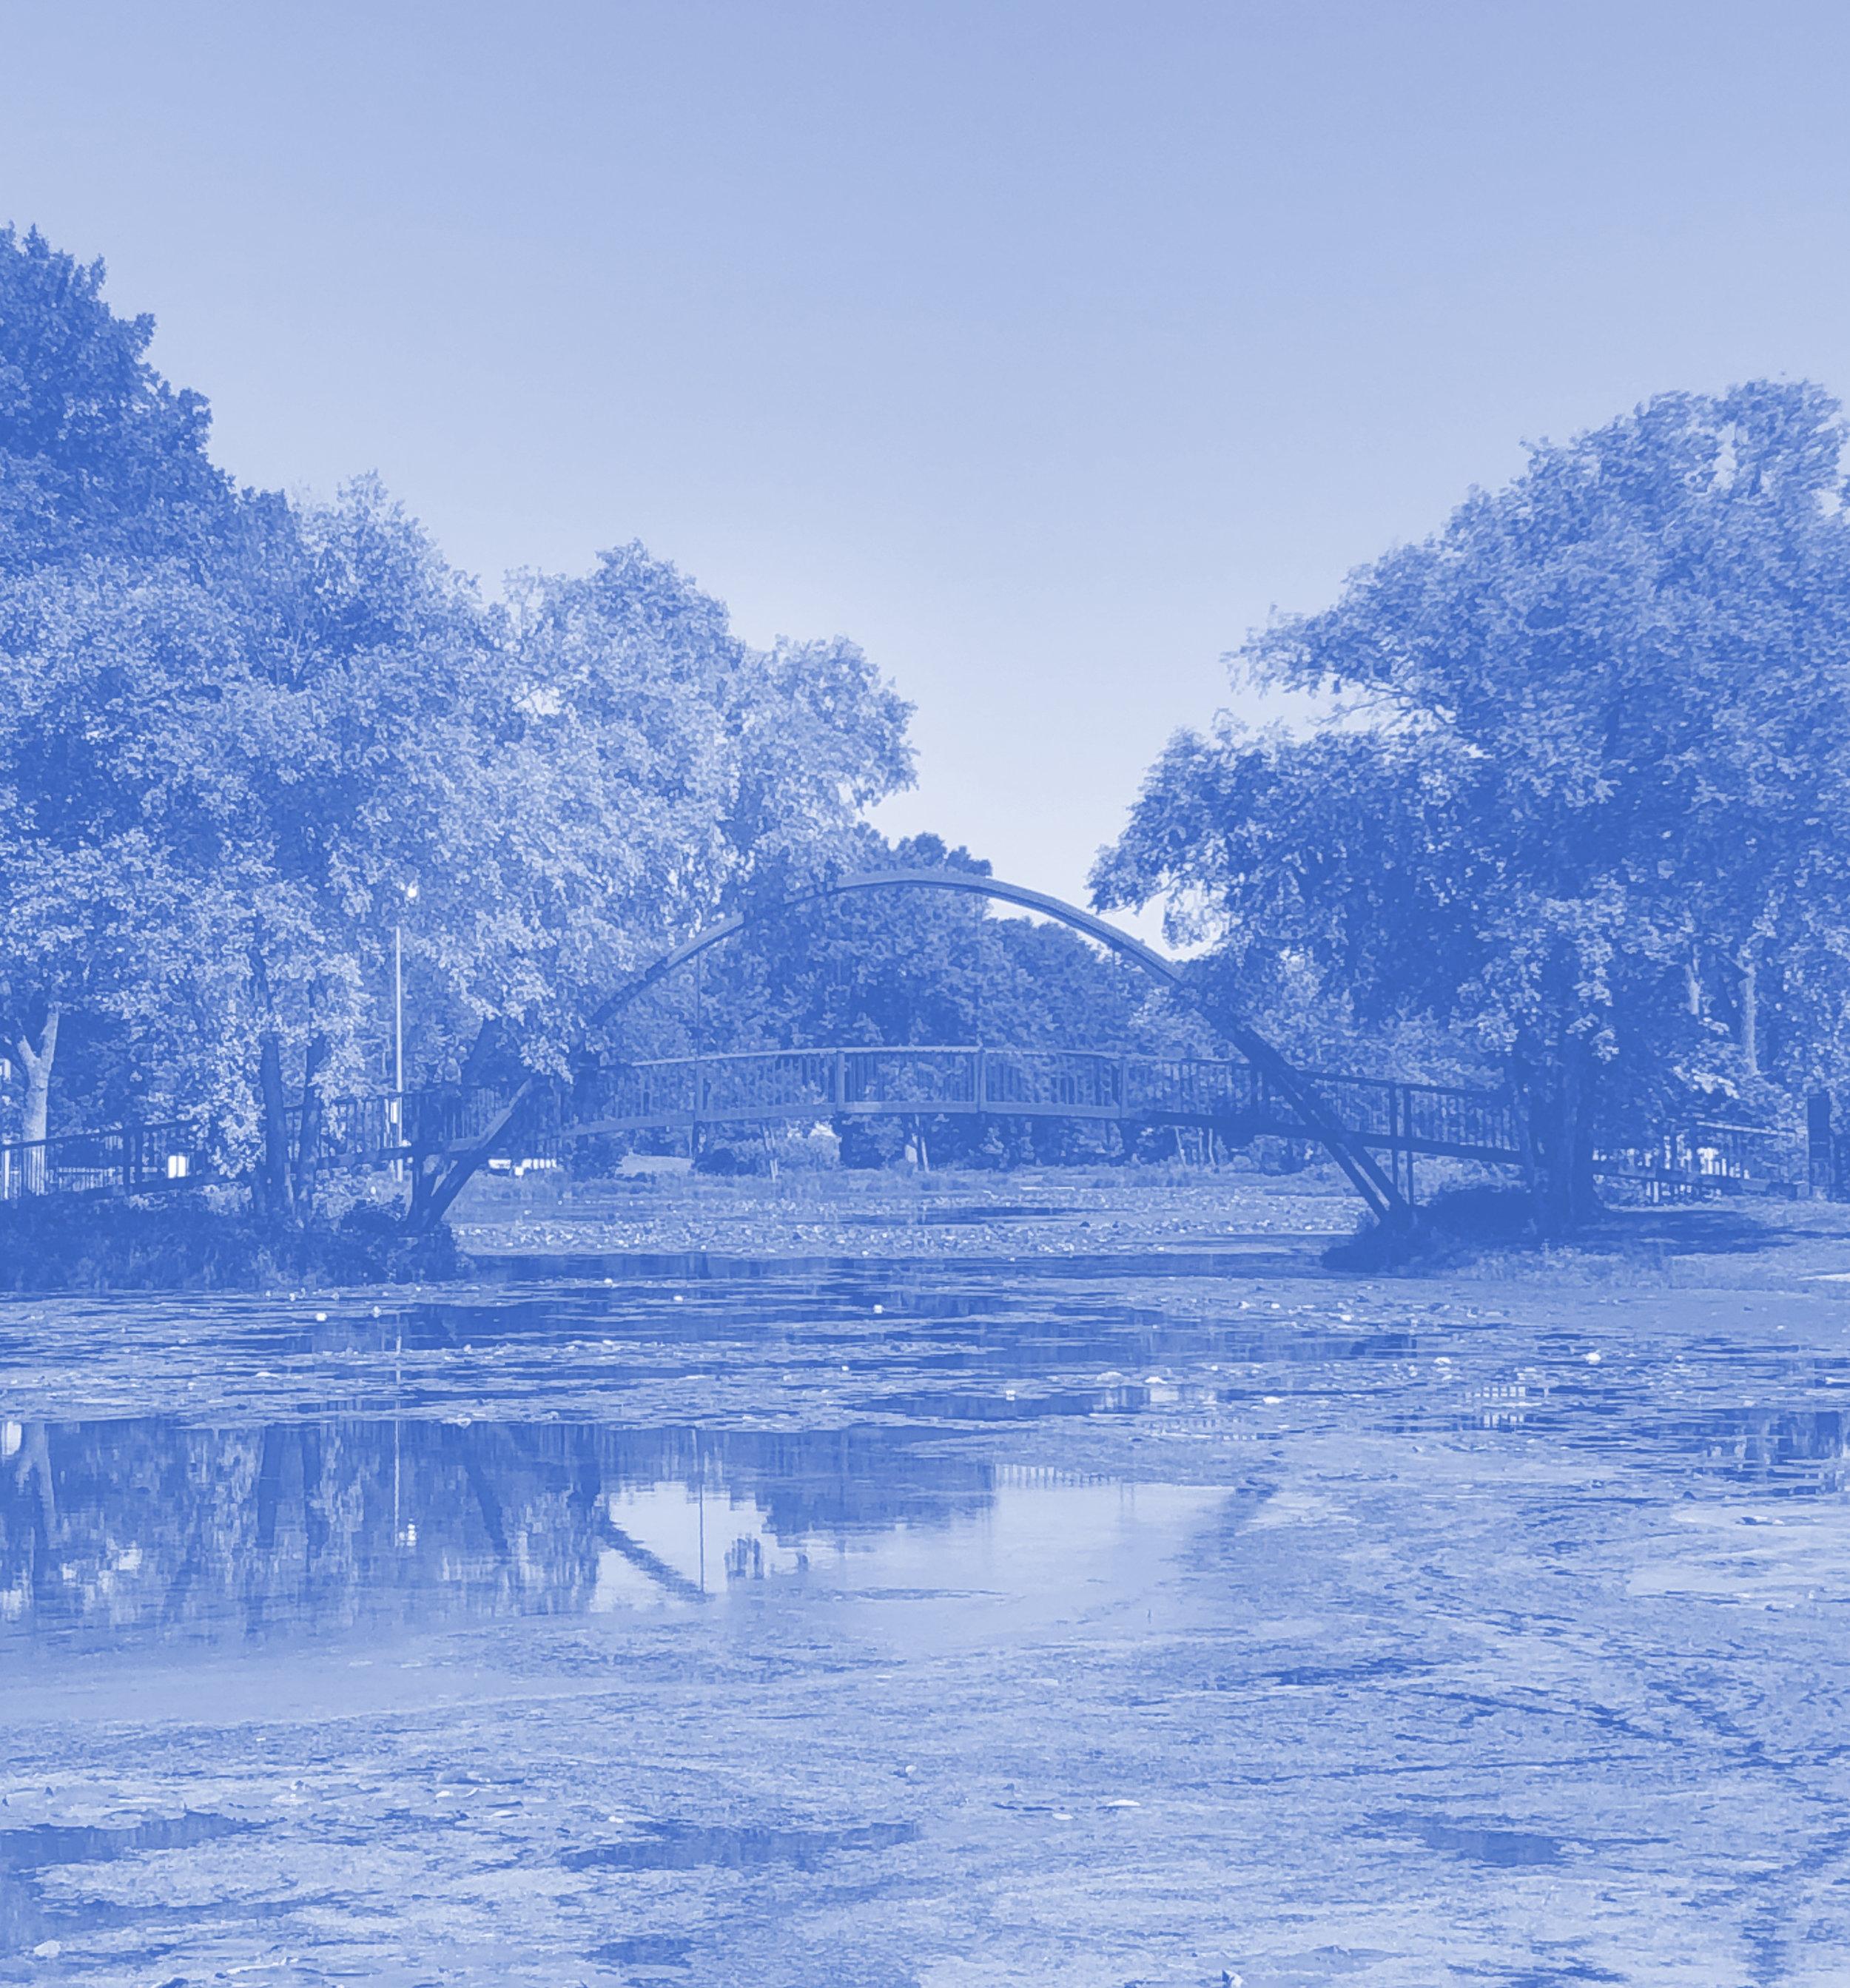 blue-bridge-pic.jpg